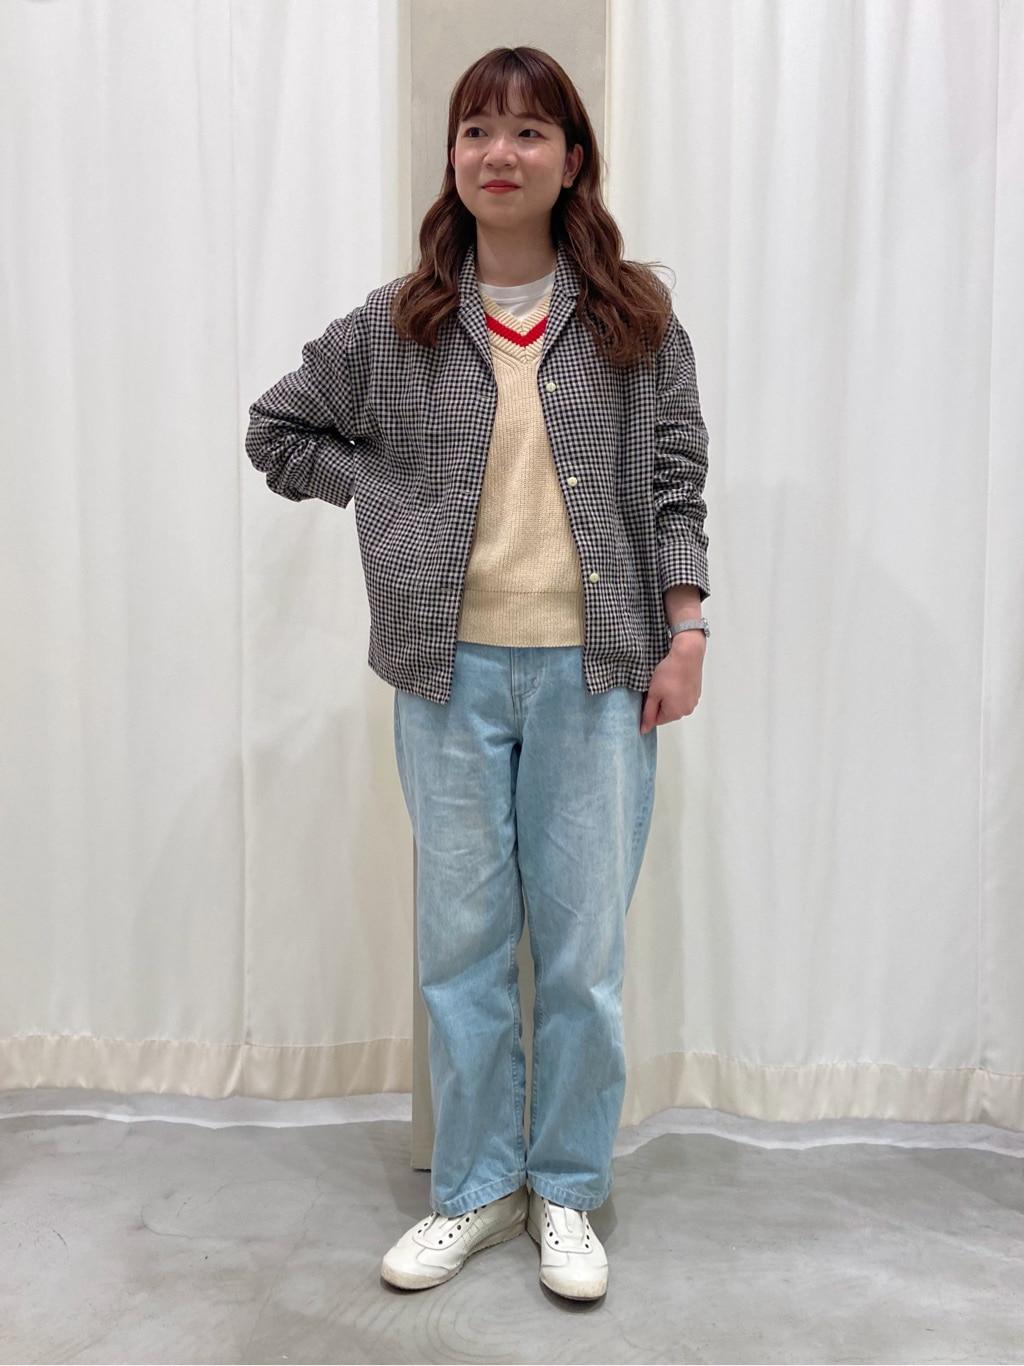 - CHILD WOMAN CHILD WOMAN , PAR ICI 東京スカイツリータウン・ソラマチ 身長:165cm 2021.02.16